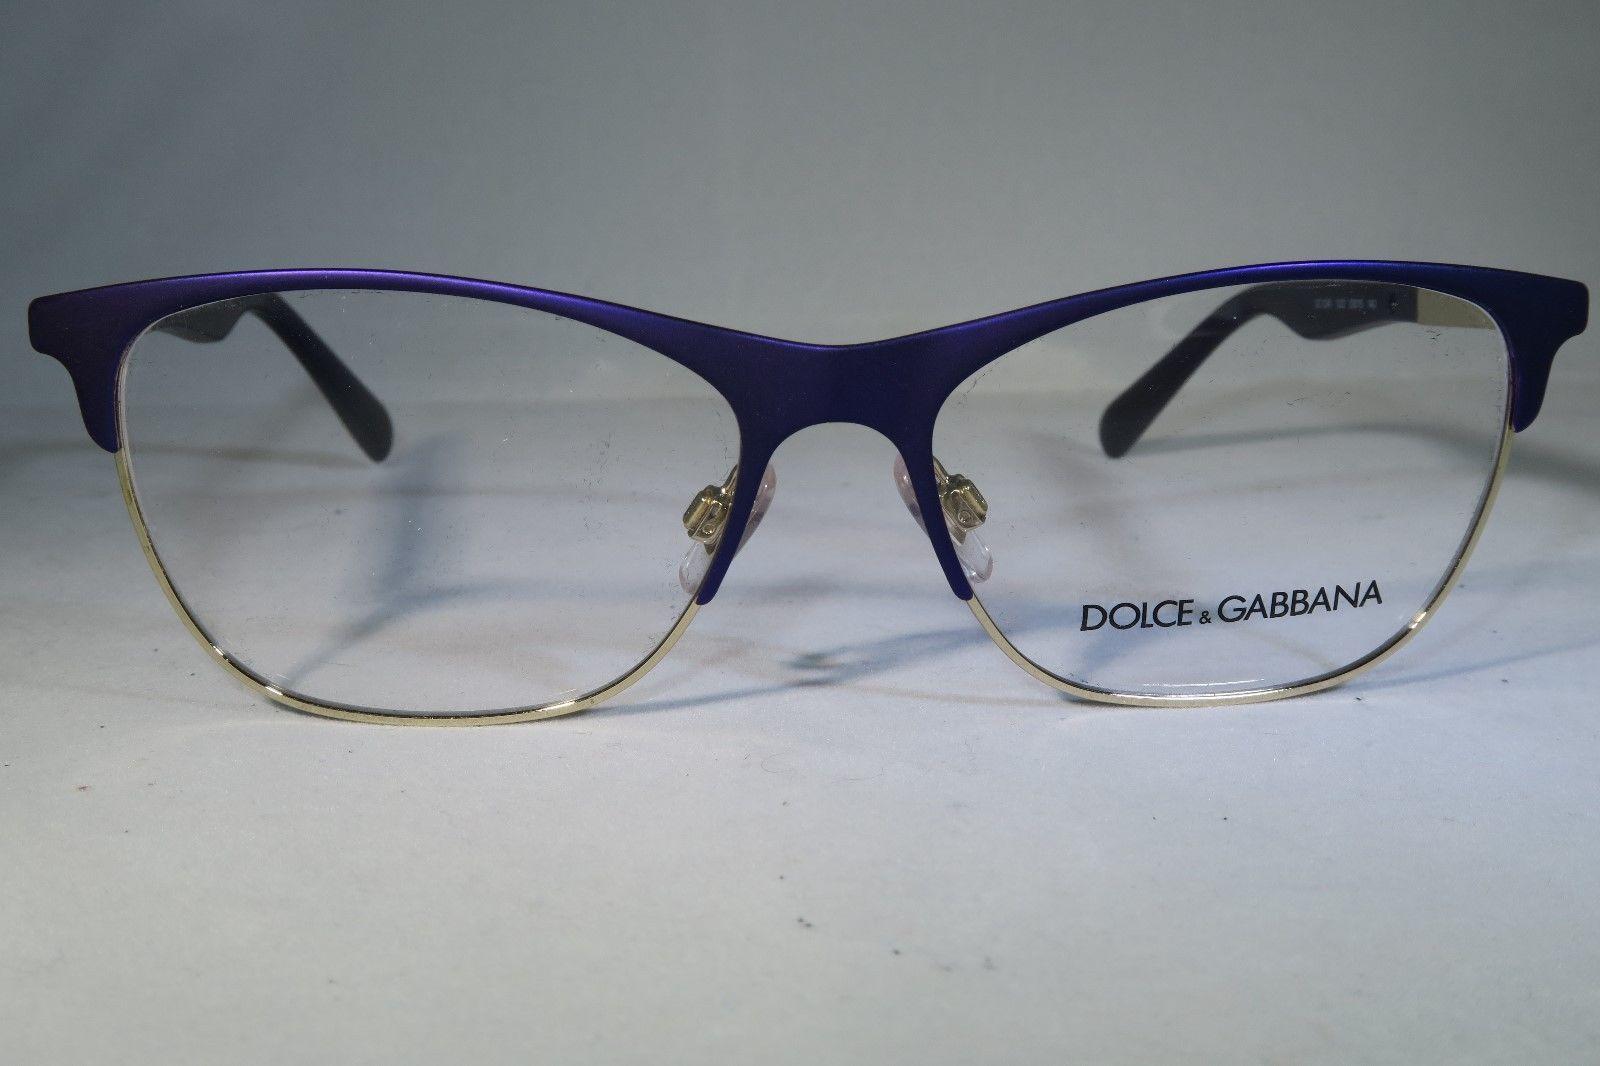 dolce gabbana dg 1246 1222 purple gold new eyeglasses 53mm 15mm 140mm ebay - Dolce Gabbana Frames